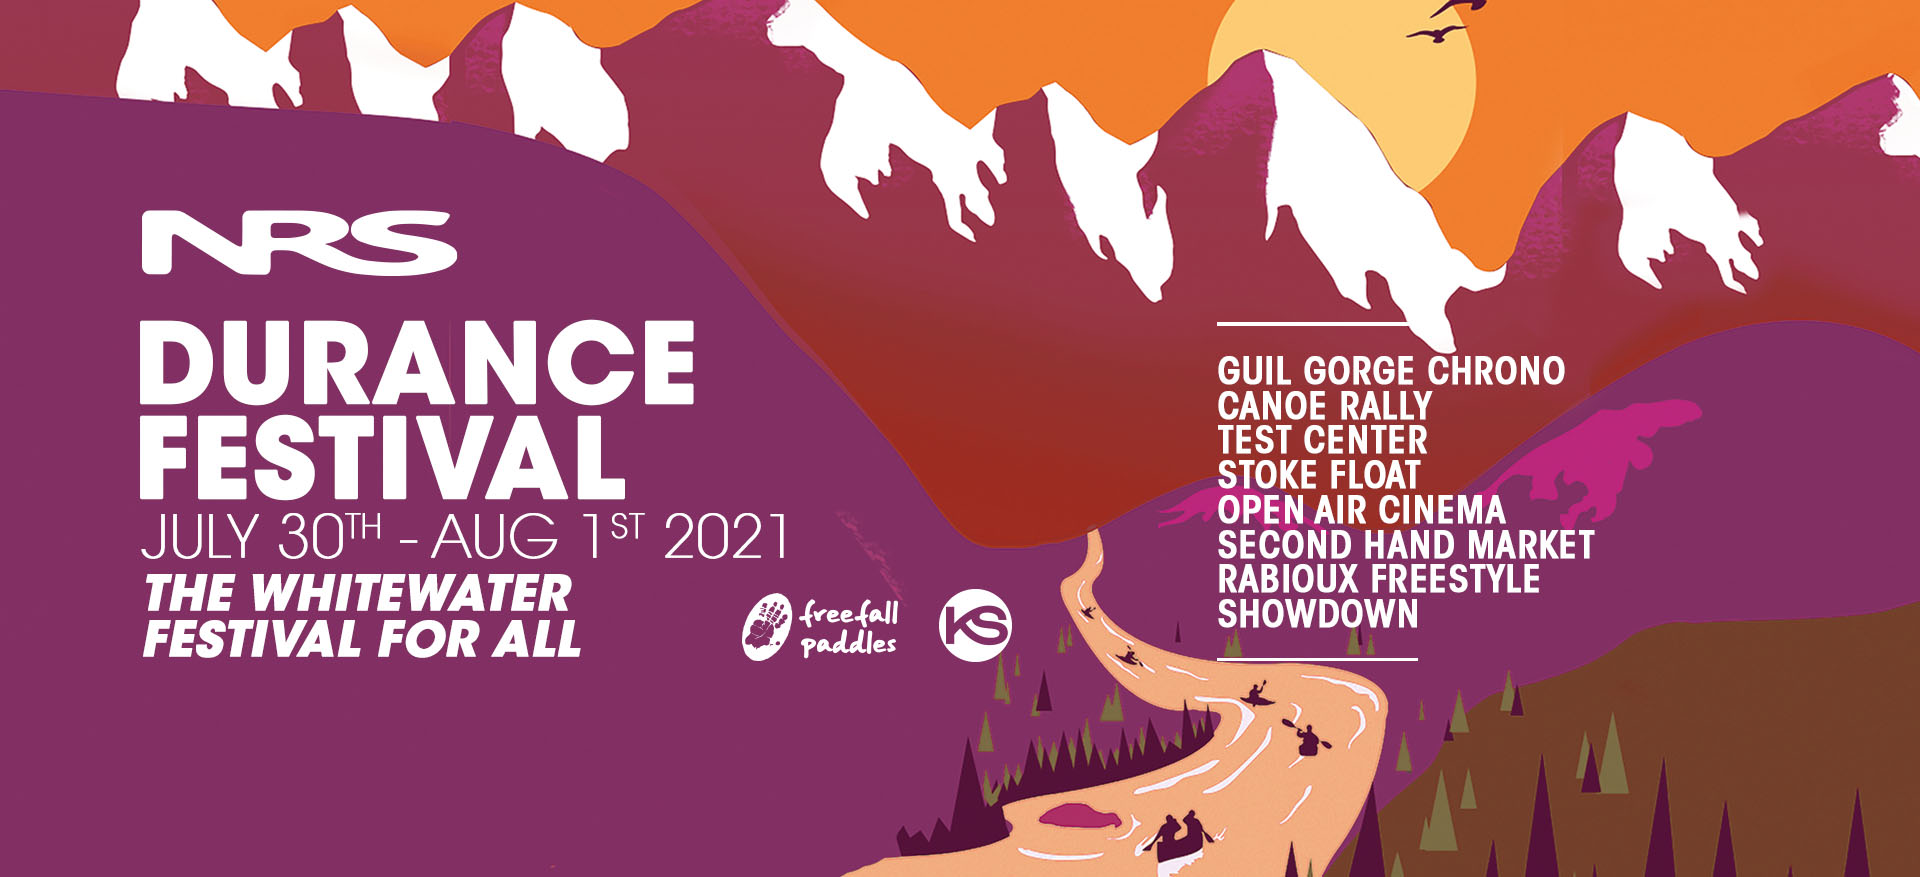 Durance Festival 2021